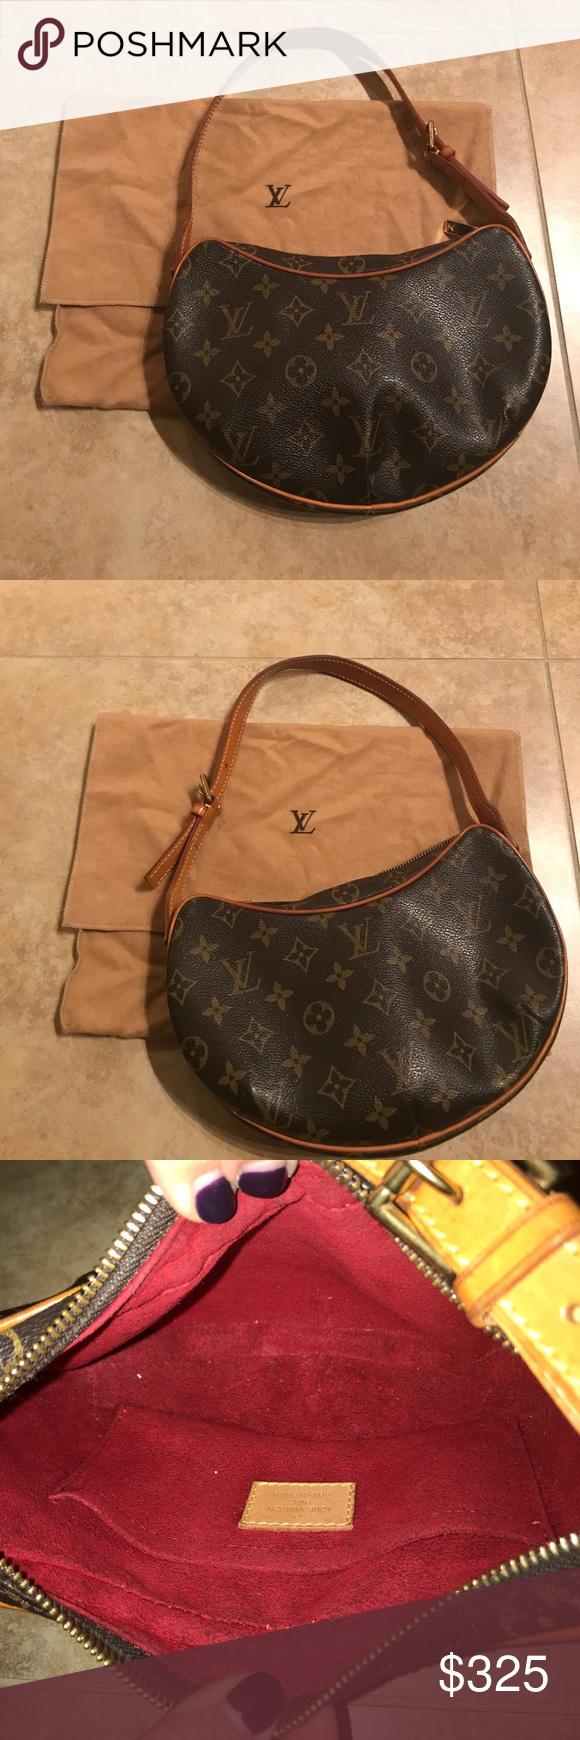 a42a99e3c7e AUTHENTIC Louis Vuitton small purse. AUTHENTIC Louis Vuitton small kidney  shape bag. Gently used. With dust bag. Louis Vuitton Bags Shoulder Bags